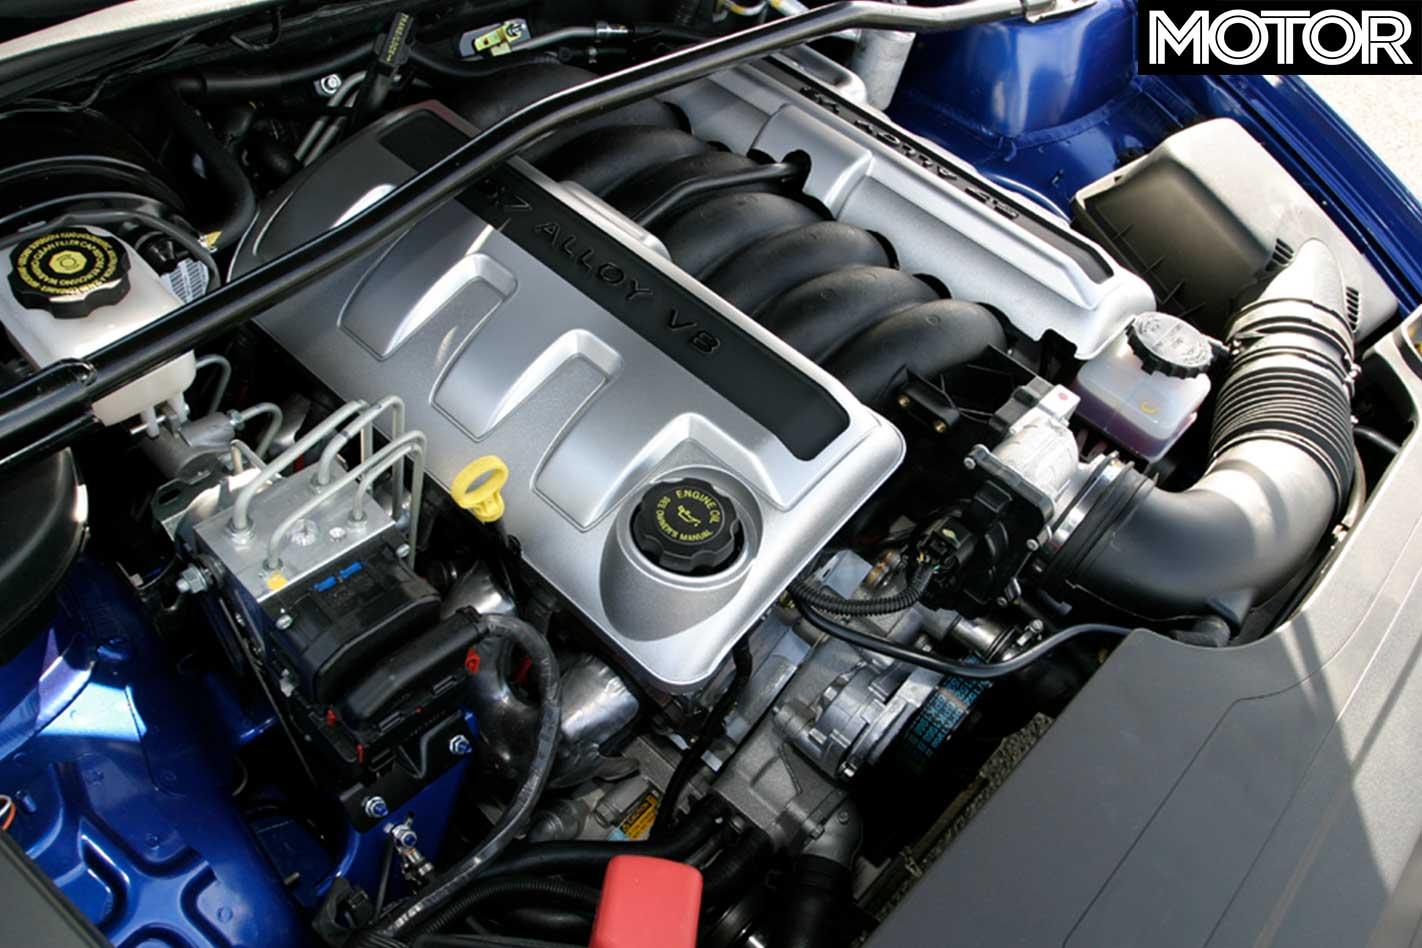 2004 Holden VZ SS ute performance review: classic MOTOR